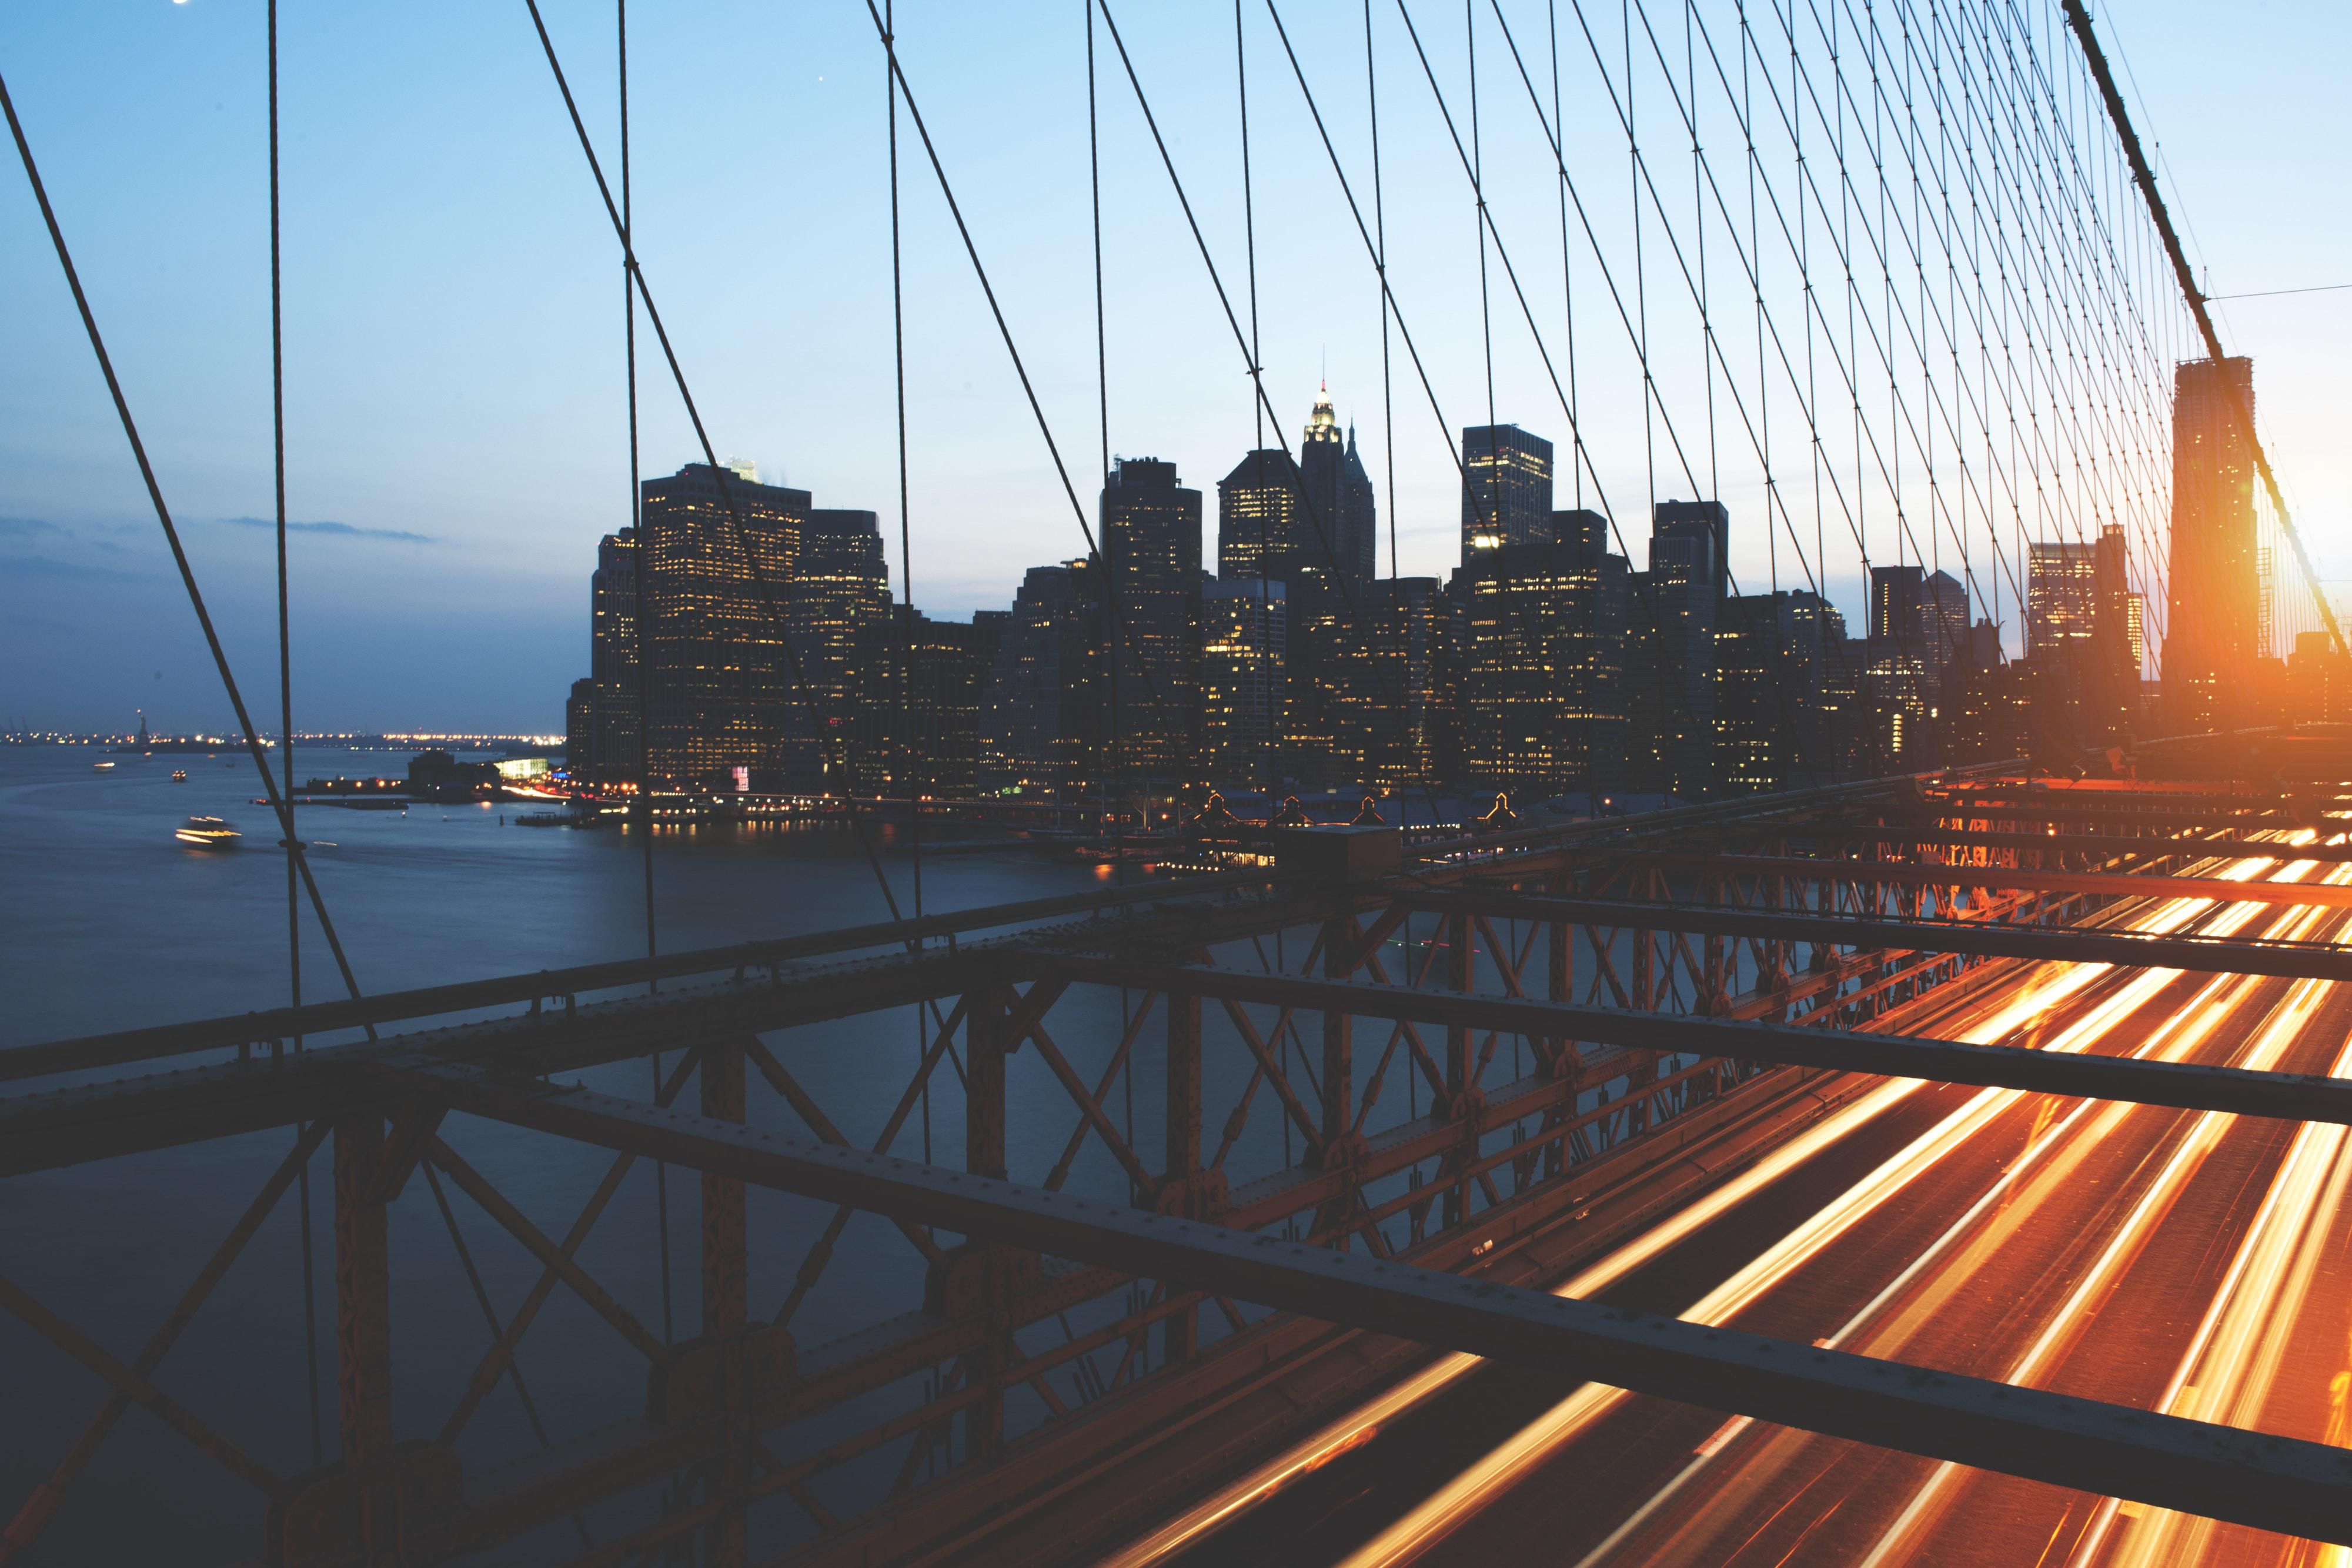 long exposure photography of bridge